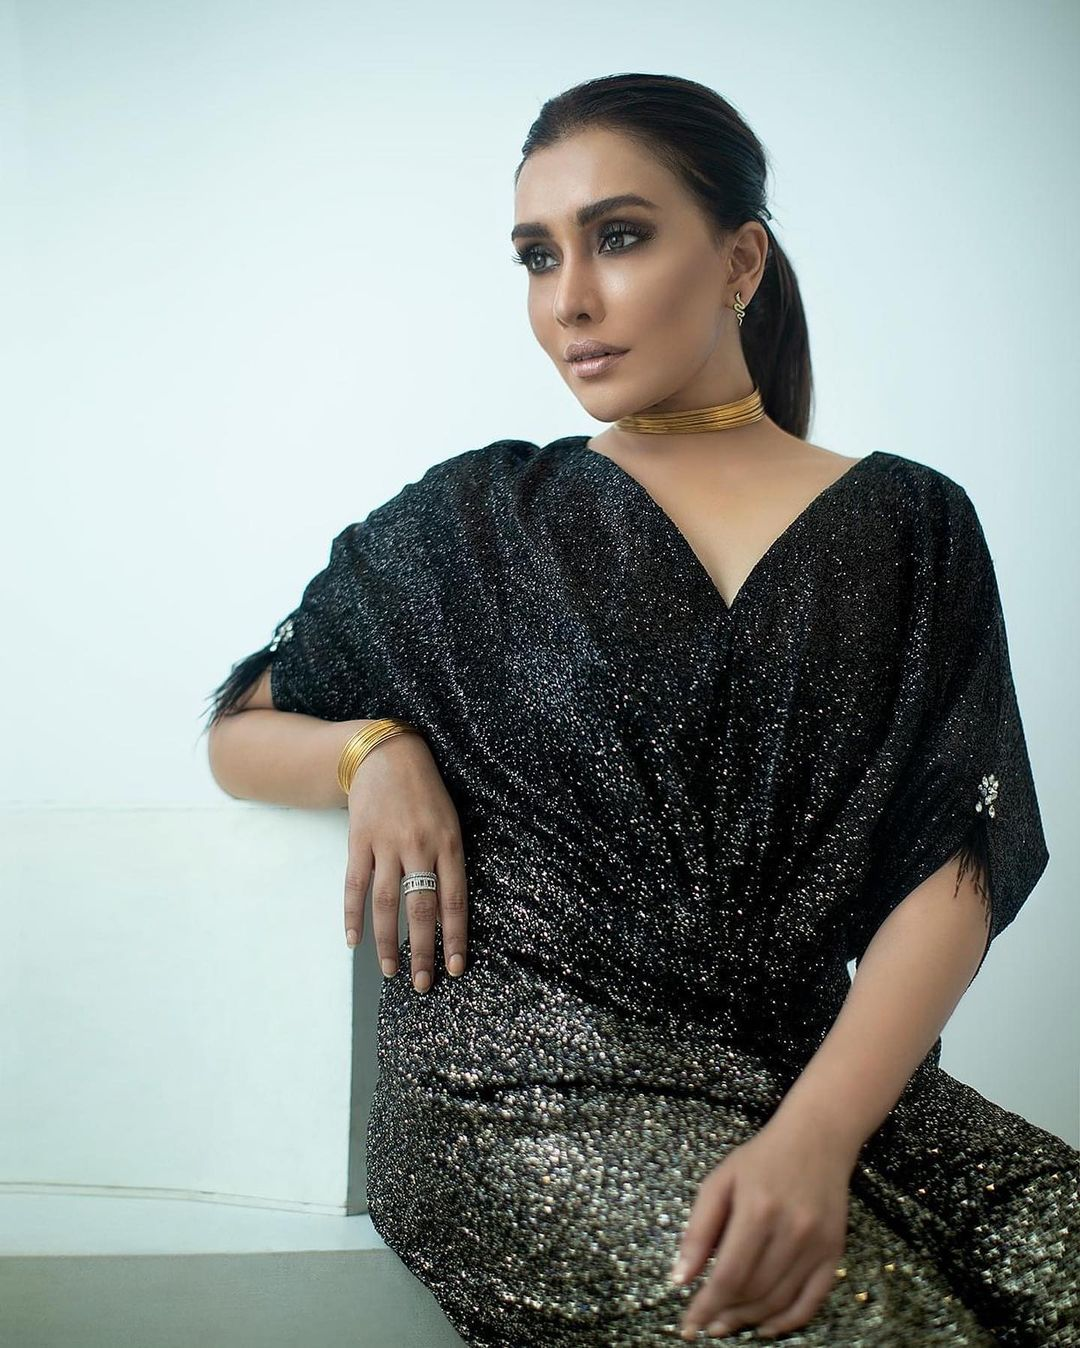 Actress Maira Khan Latest Clicks From Her Instagram